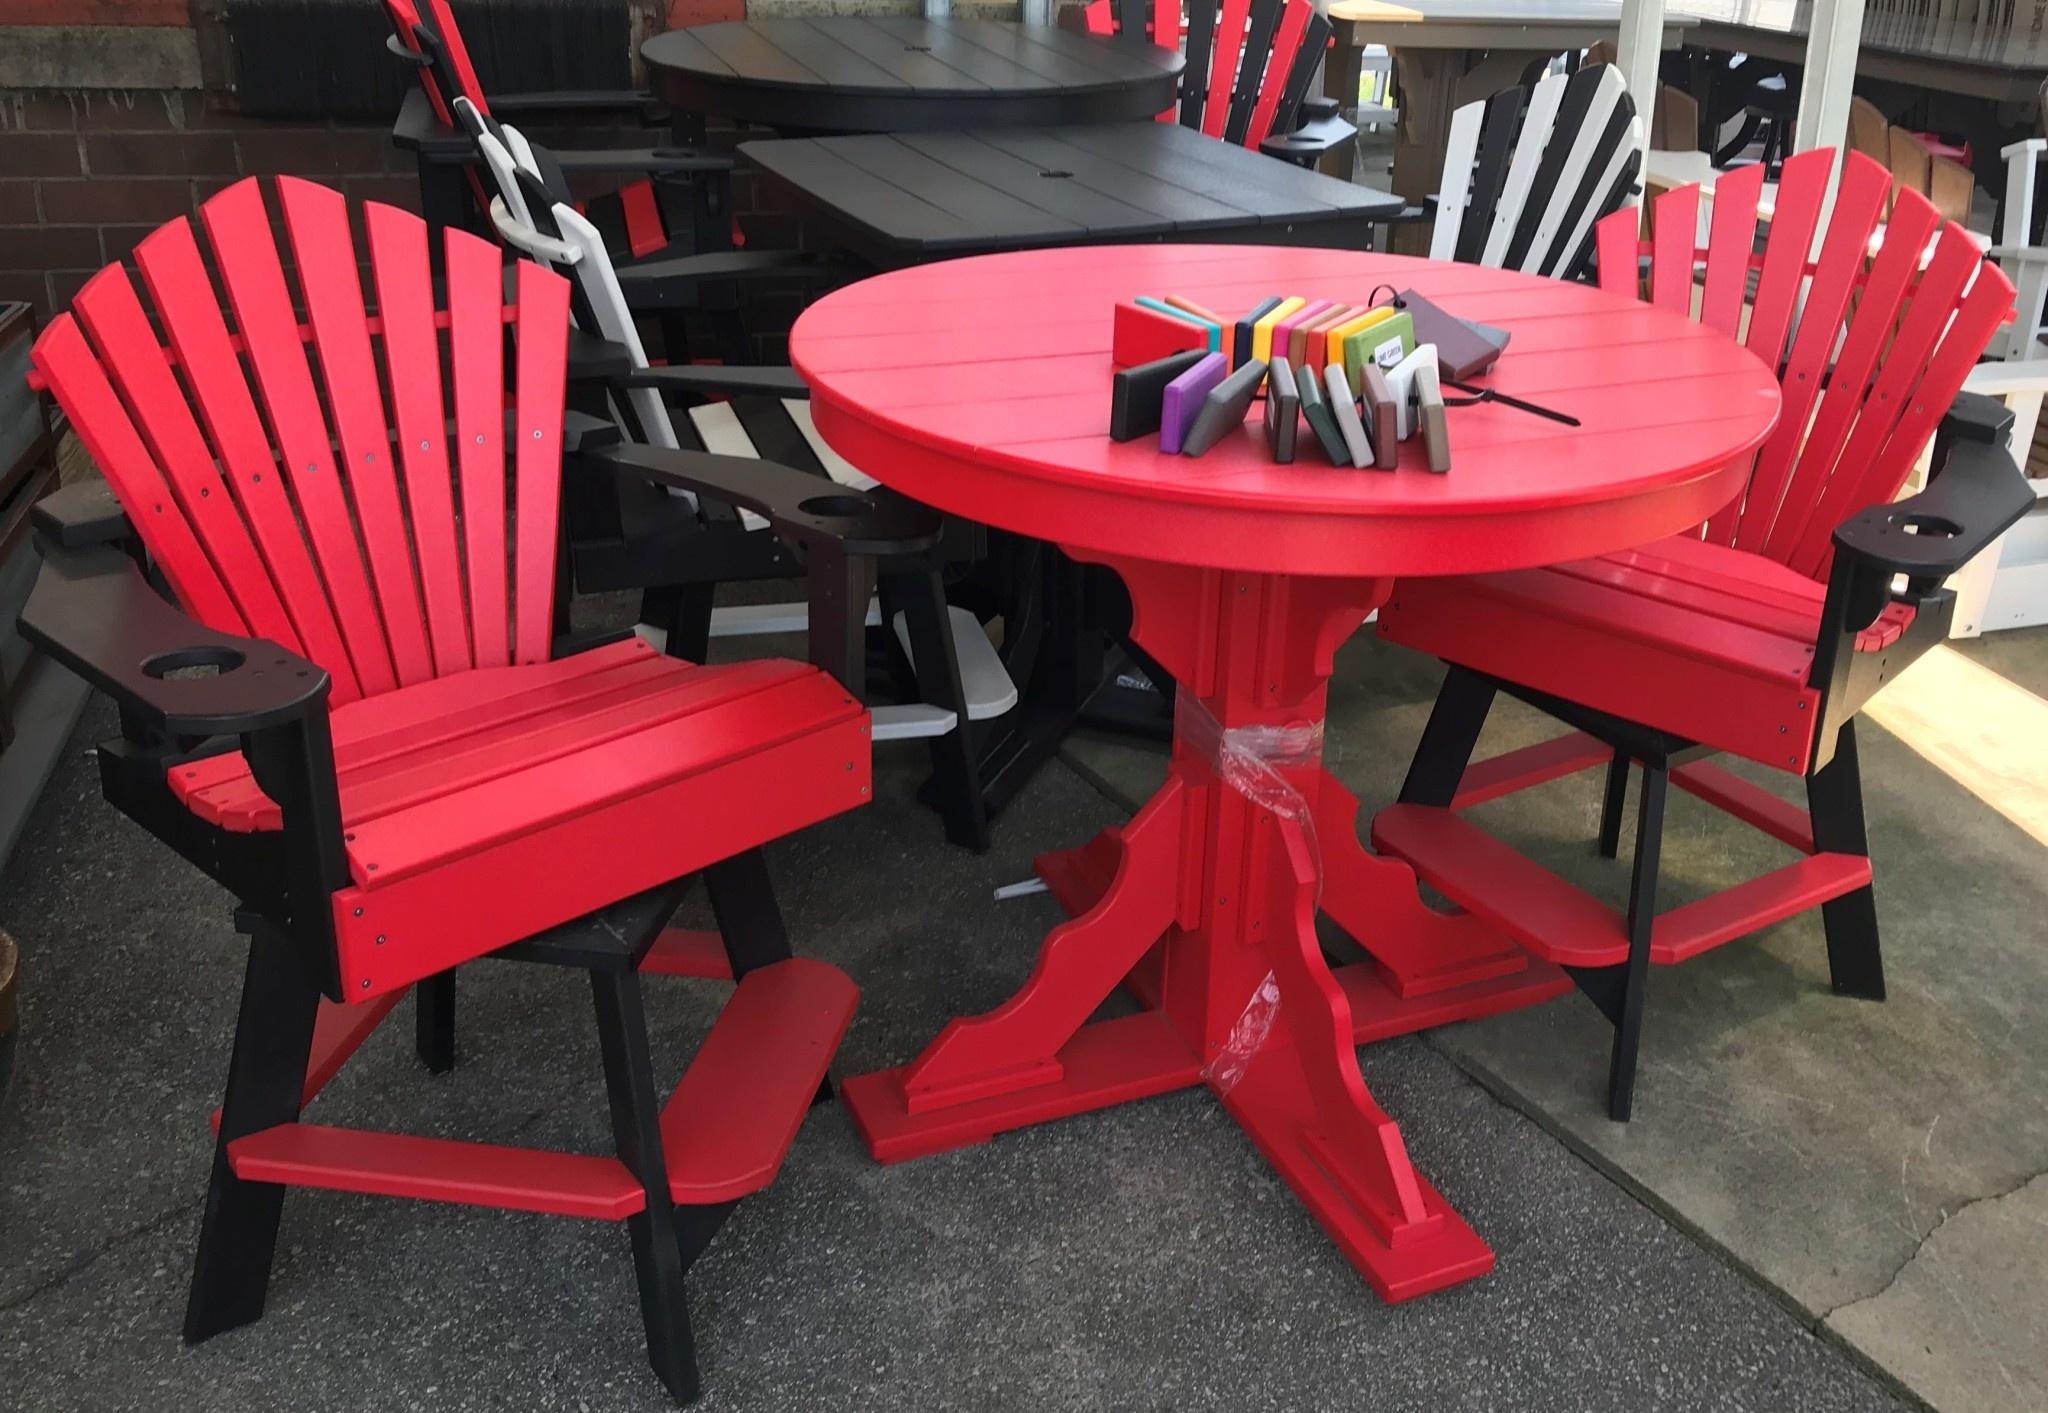 Superb Counter Height 3 Piece Table Set W Swivel Chairs Inzonedesignstudio Interior Chair Design Inzonedesignstudiocom